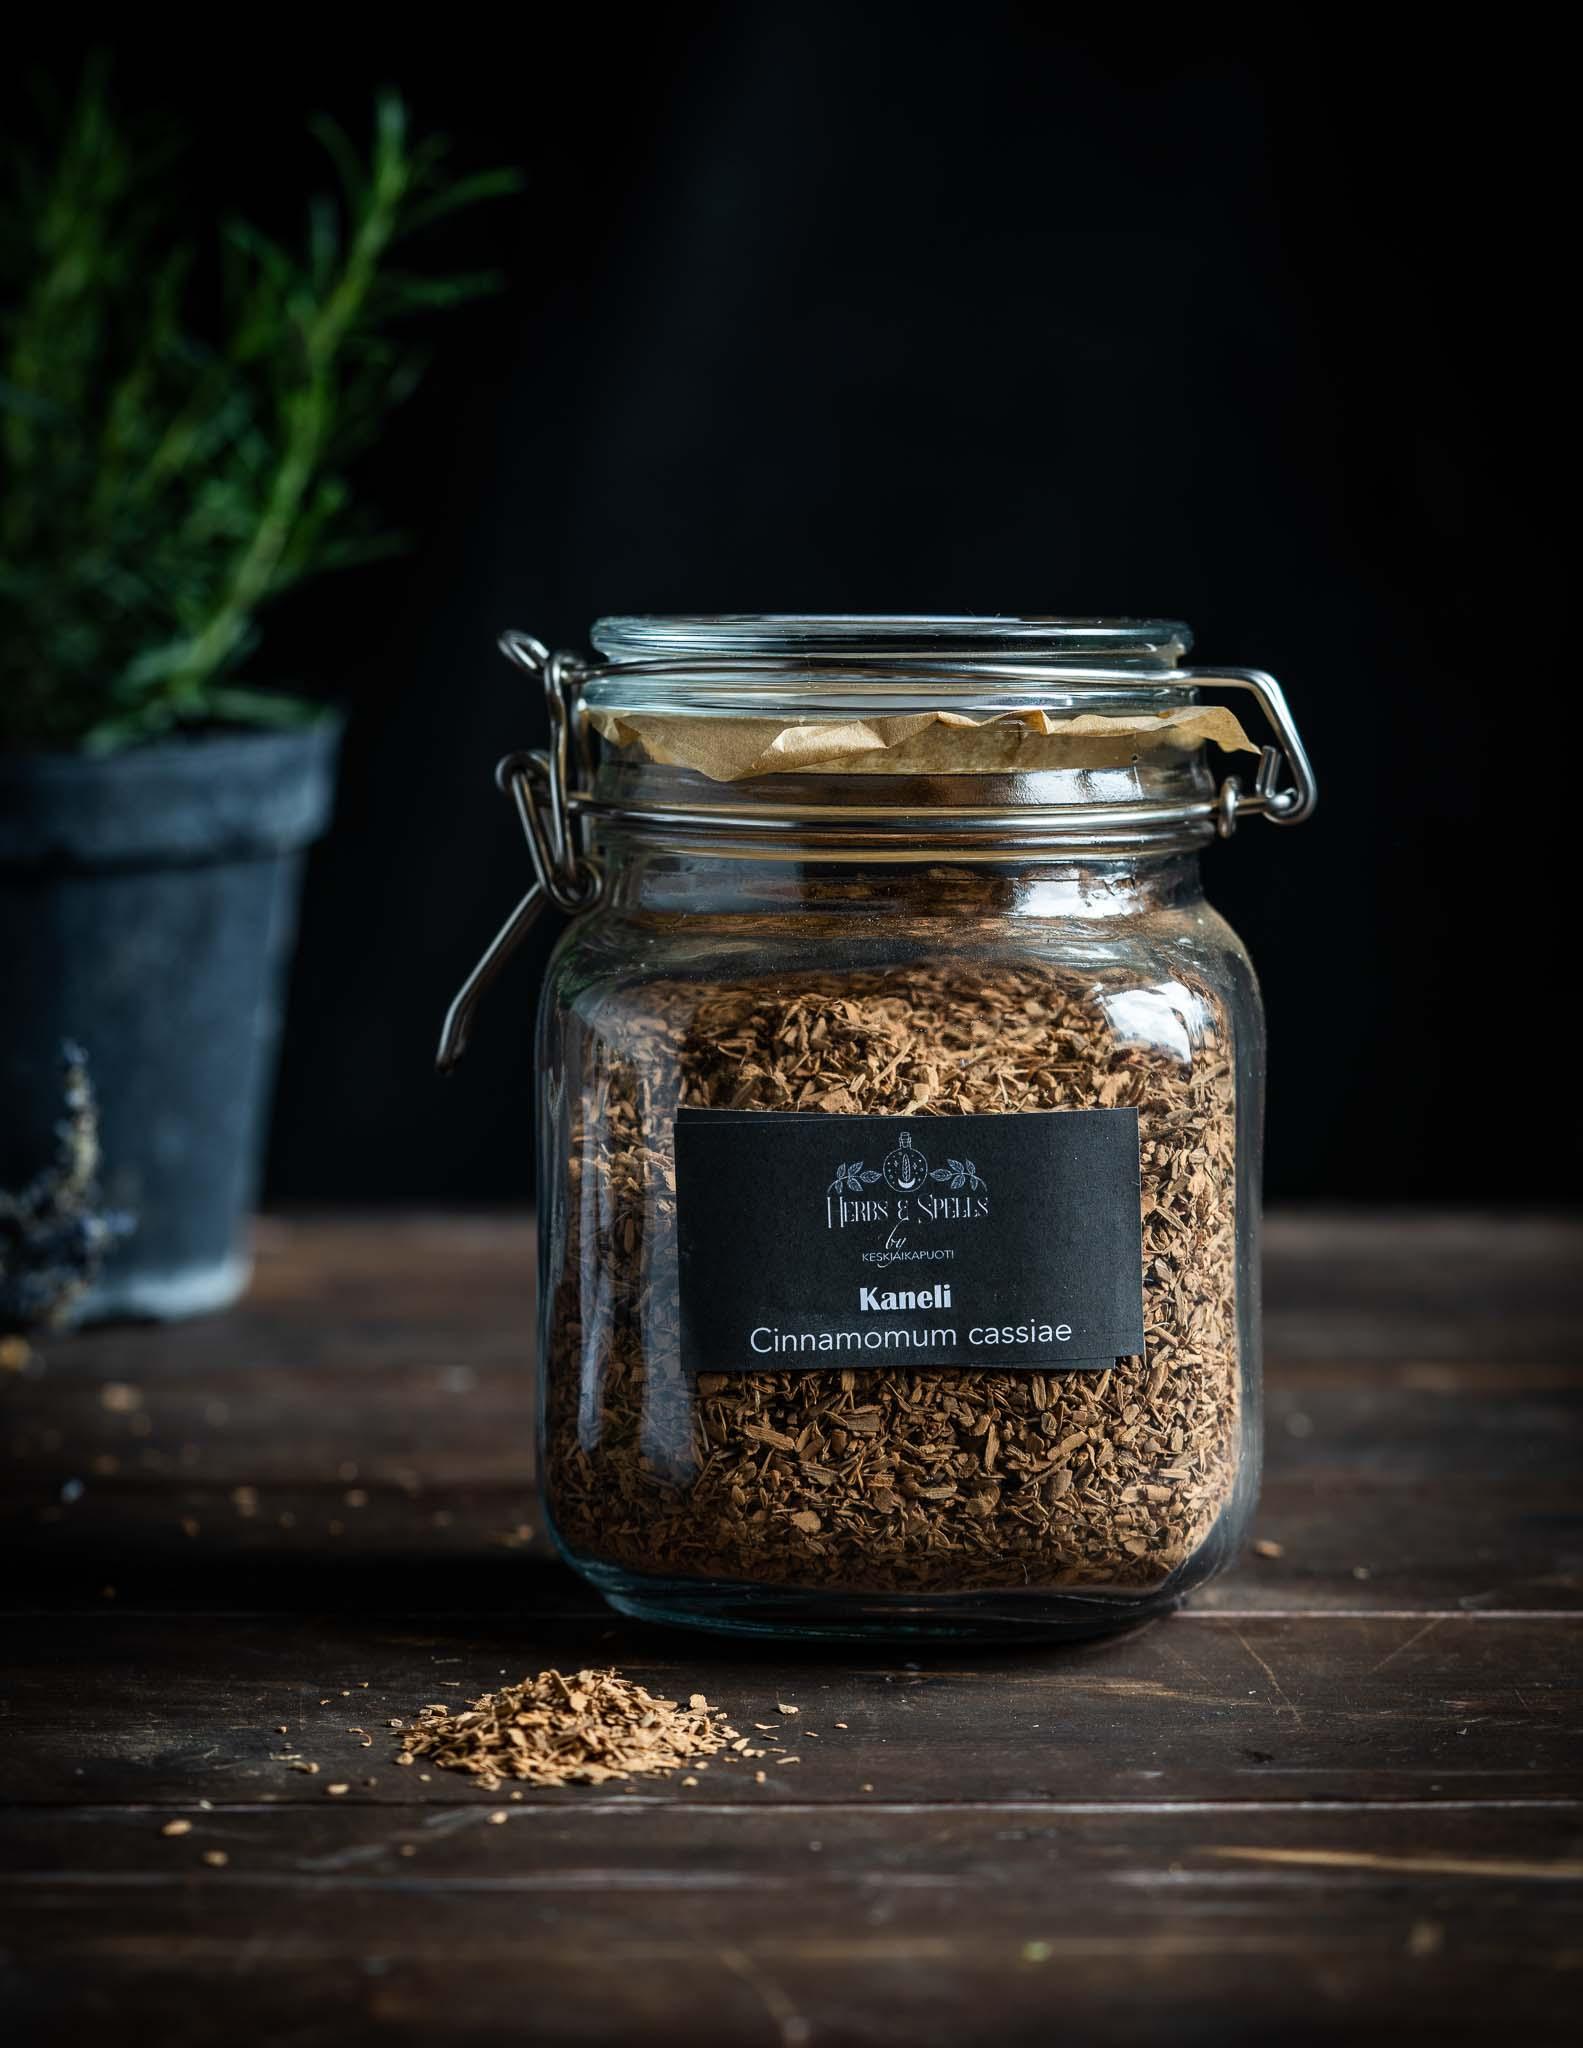 Kaneli - Cinnamomum cassiaem (Herbs&Spells by keskiaikapuoti)